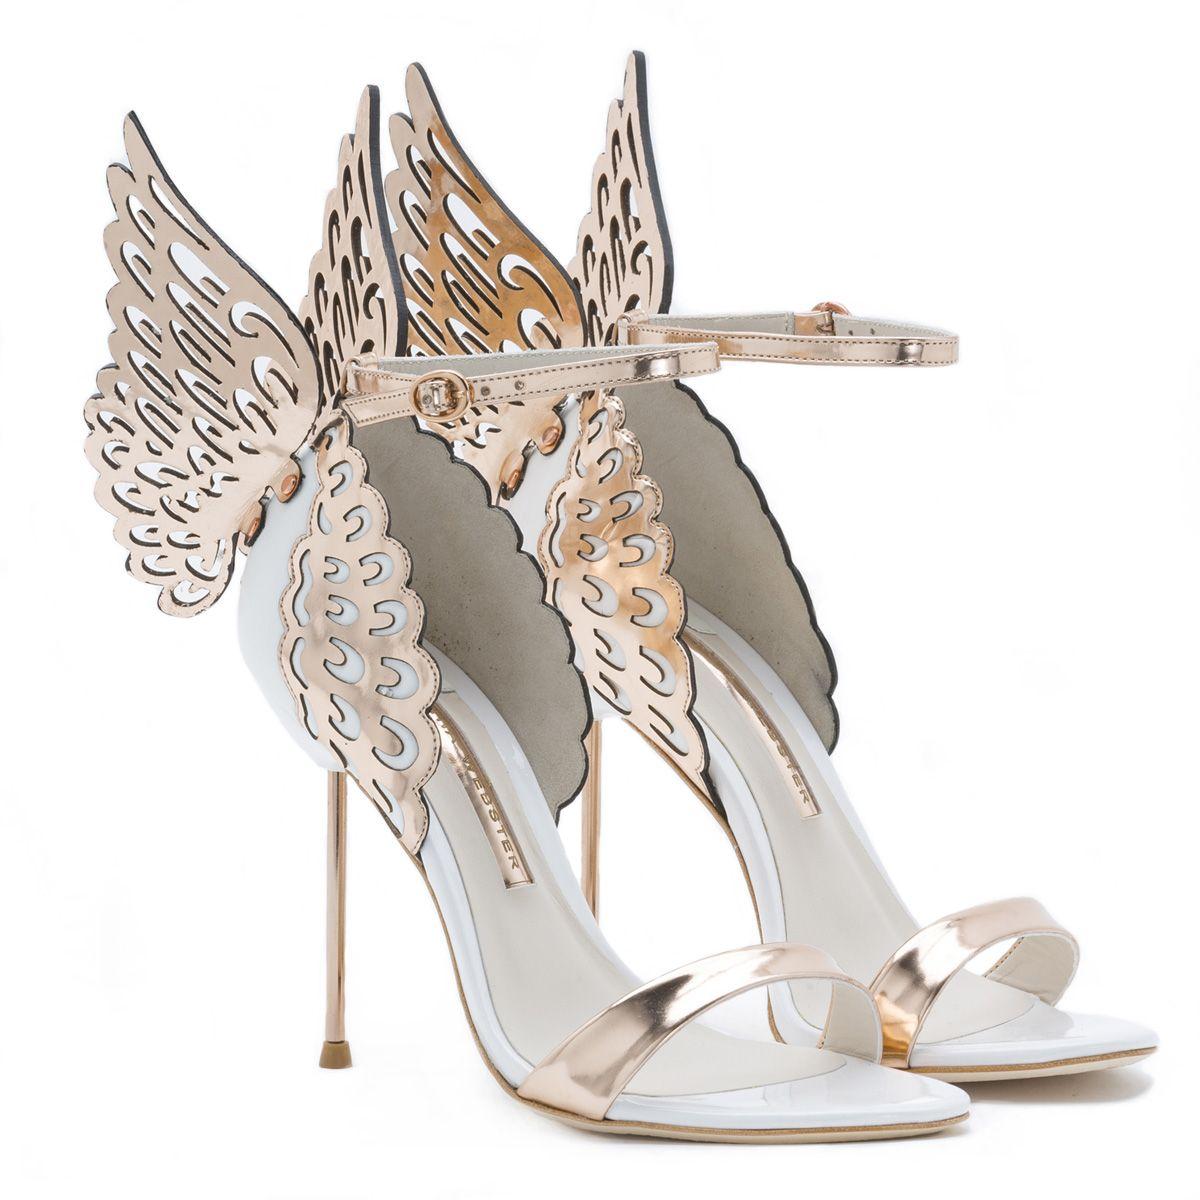 de099f8db78 Sophia Webster Angel Wing Shoes  https   ladieshighheelshoes.blogspot.com 2016